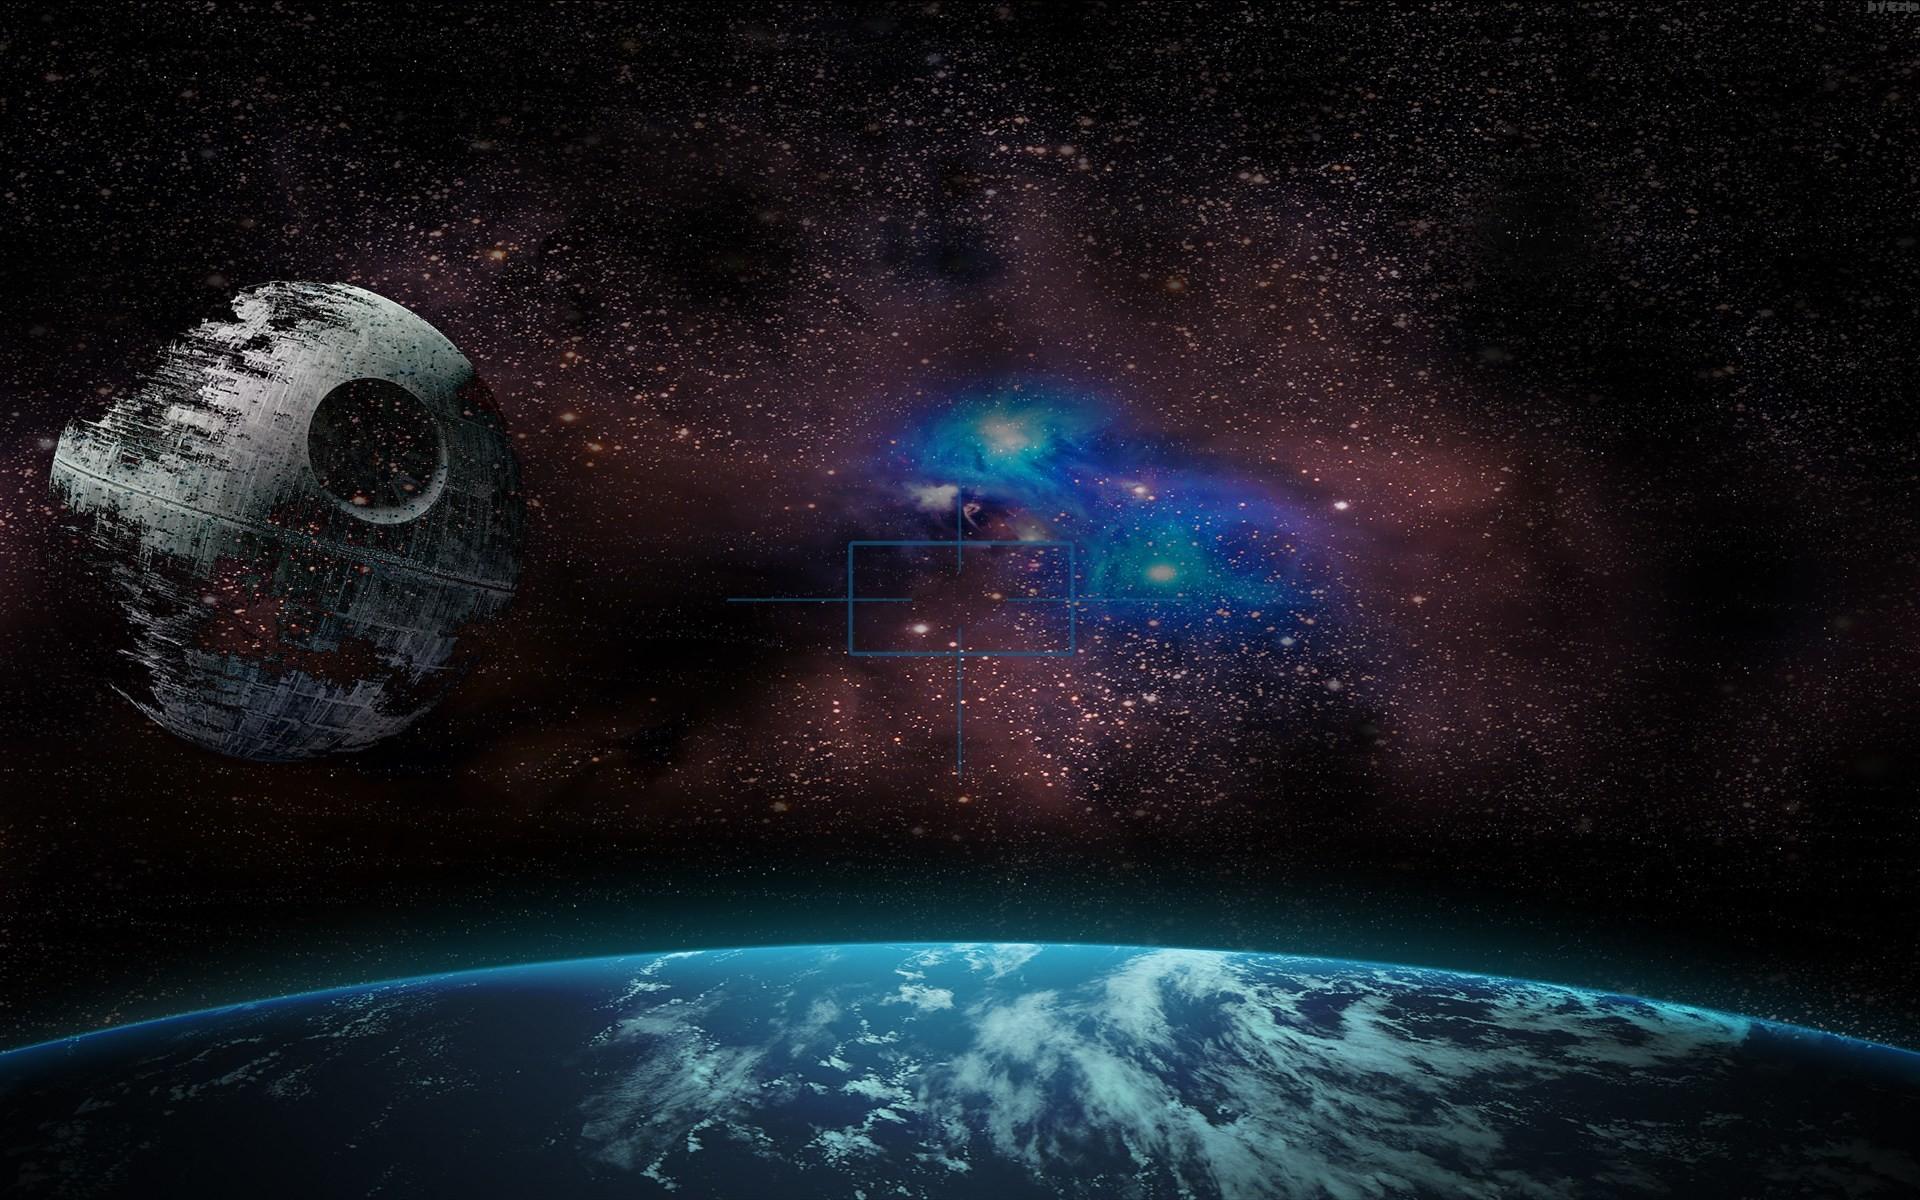 Death Star Wallpaper by ezio.